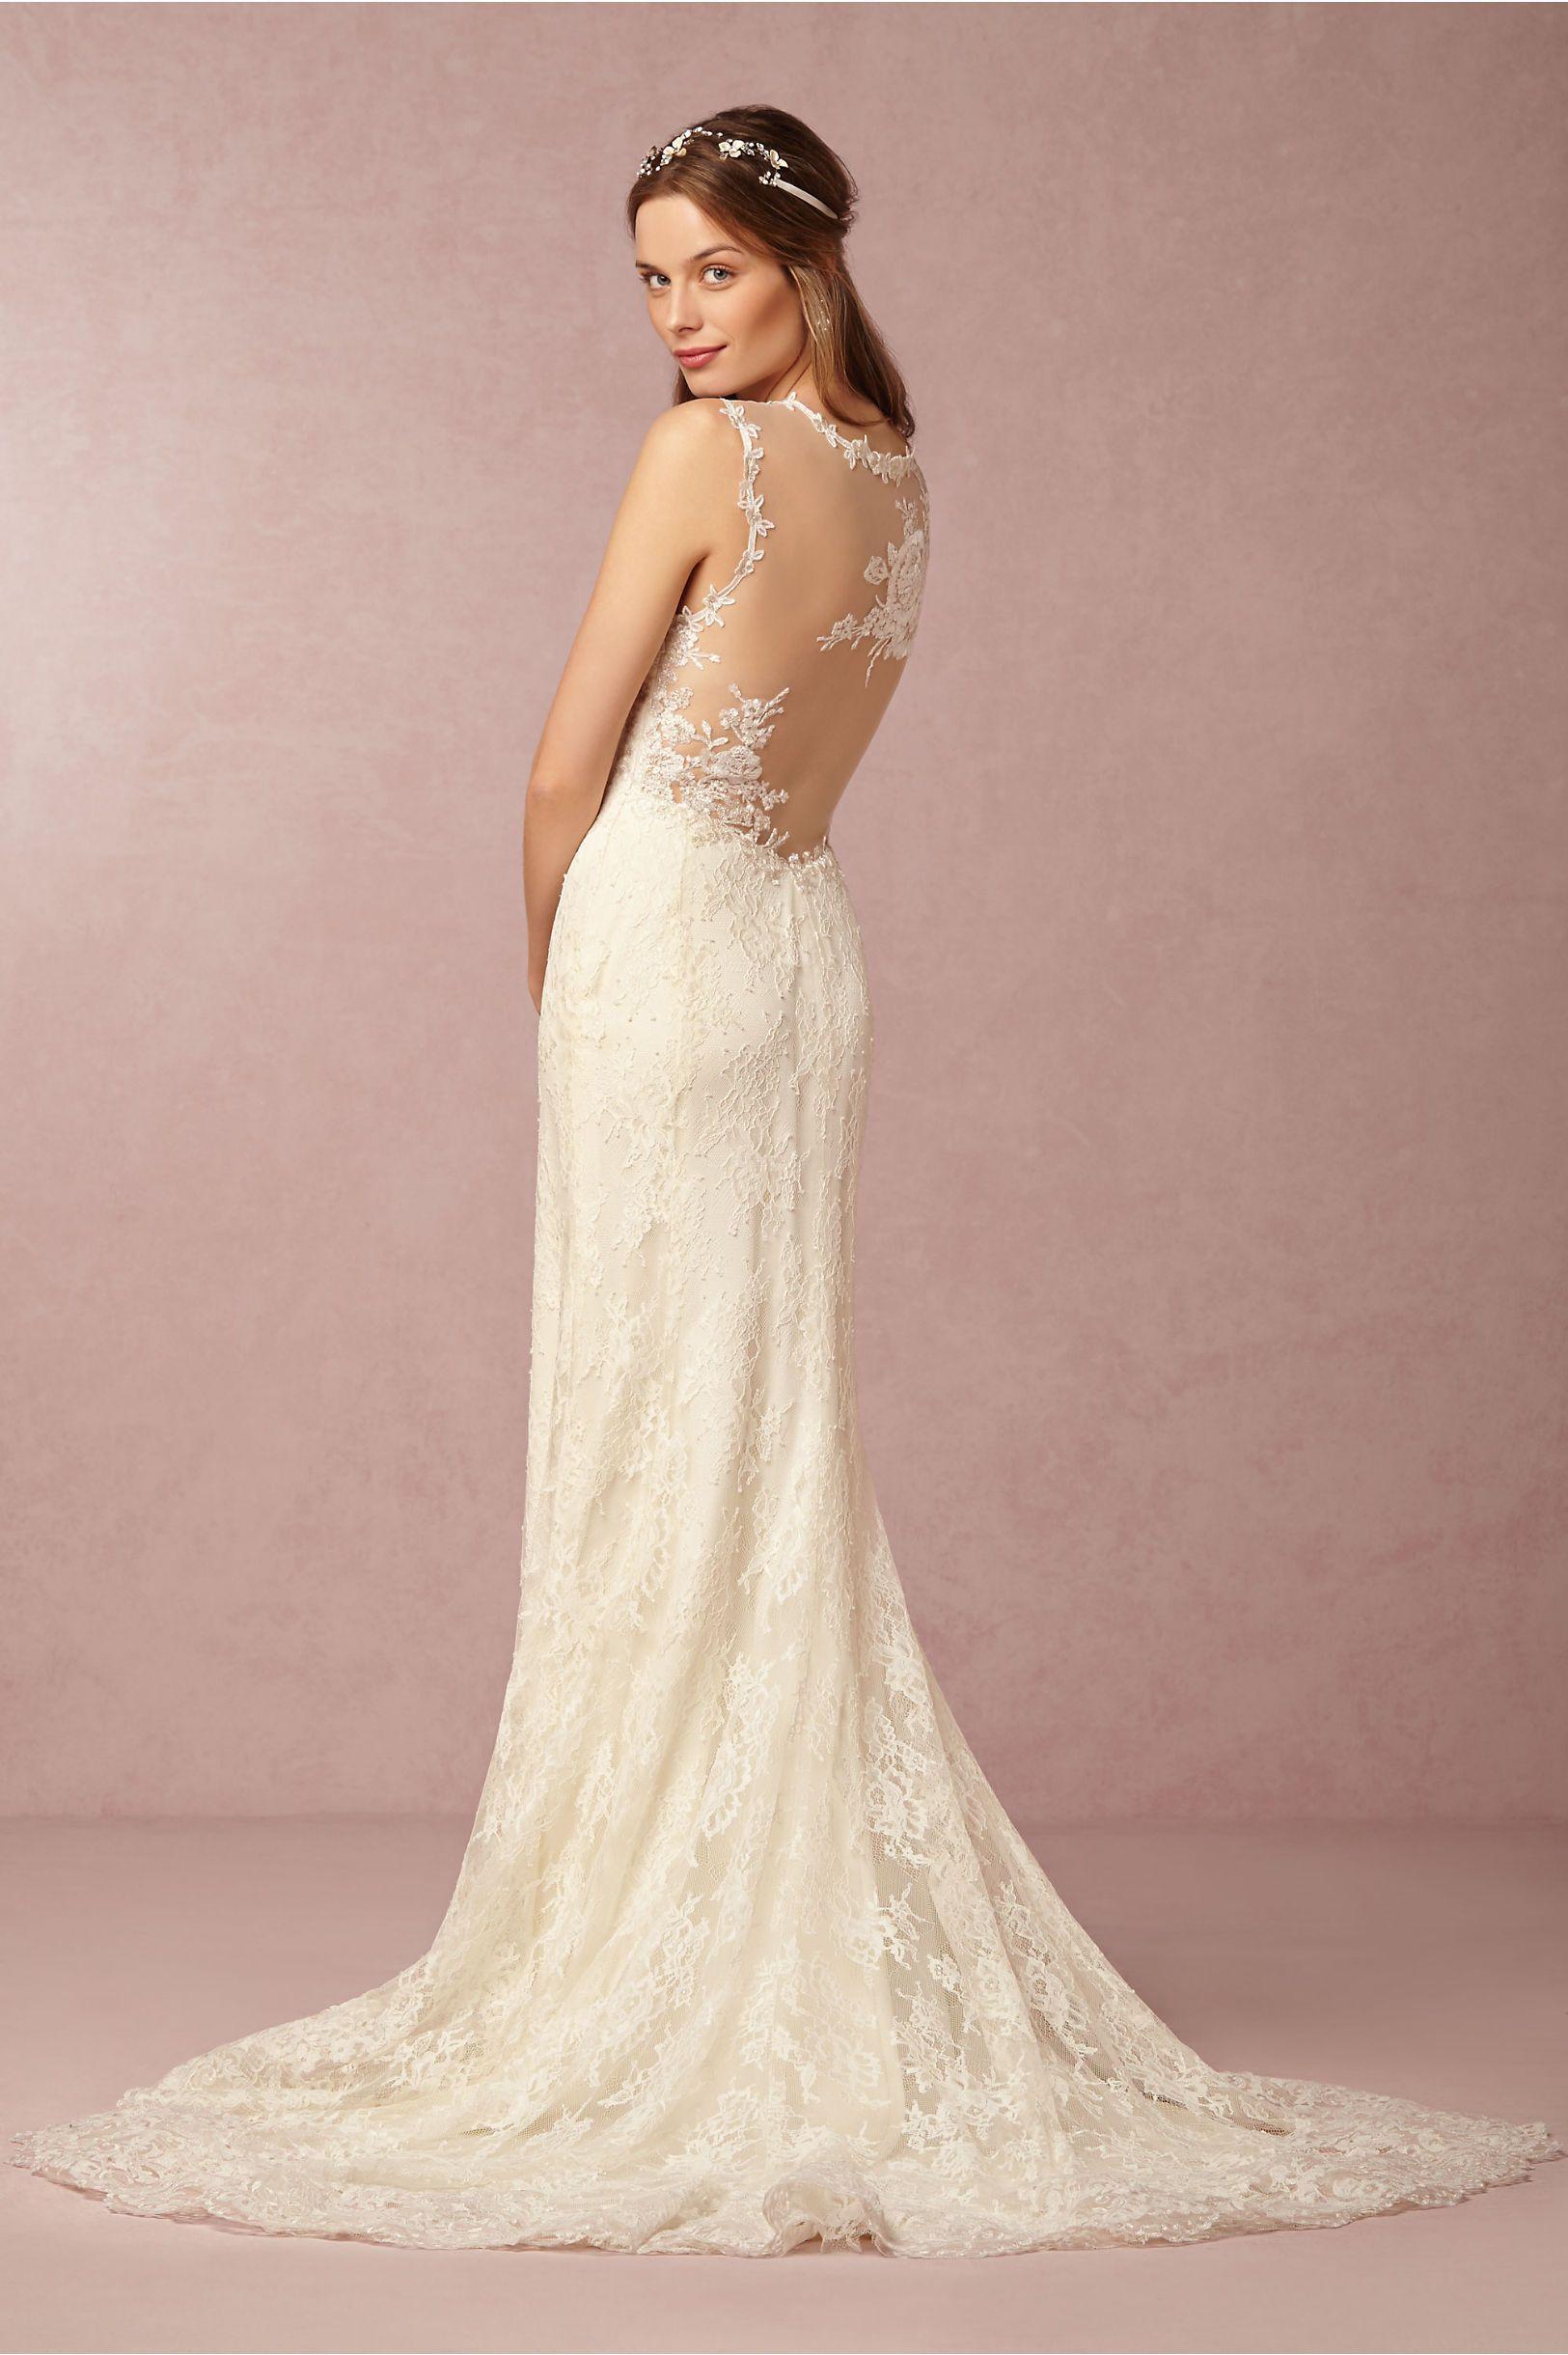 15 Beautiful Backless Wedding Dresses & Gowns | Novios